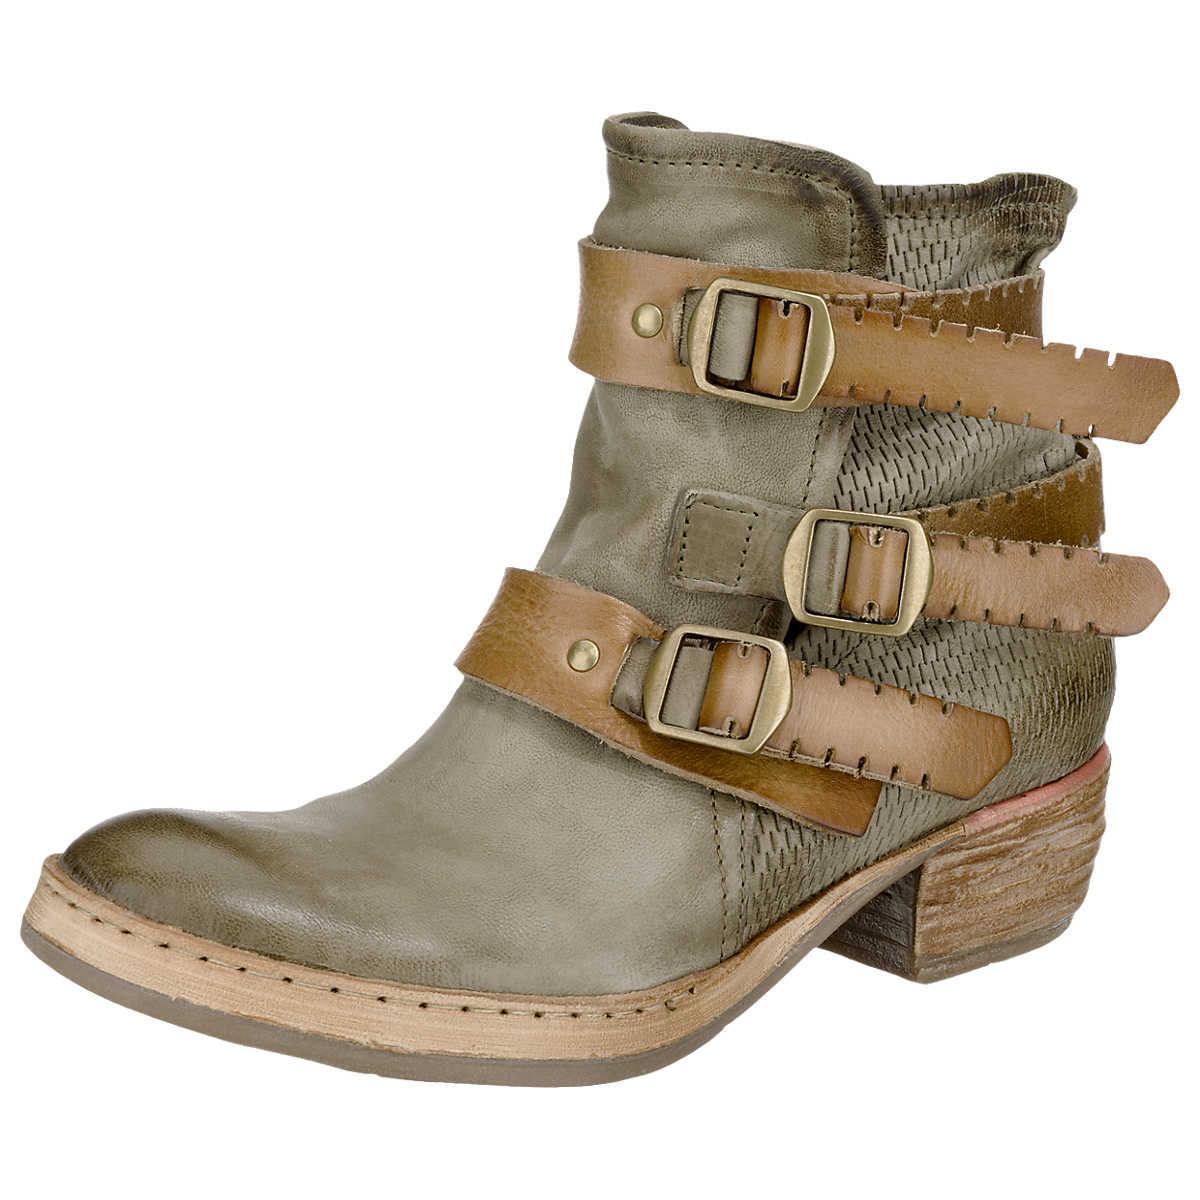 A.S.98 Haiti Stiefeletten khaki - A.S.98 - Stiefeletten - Schuhe - mirapodo.de